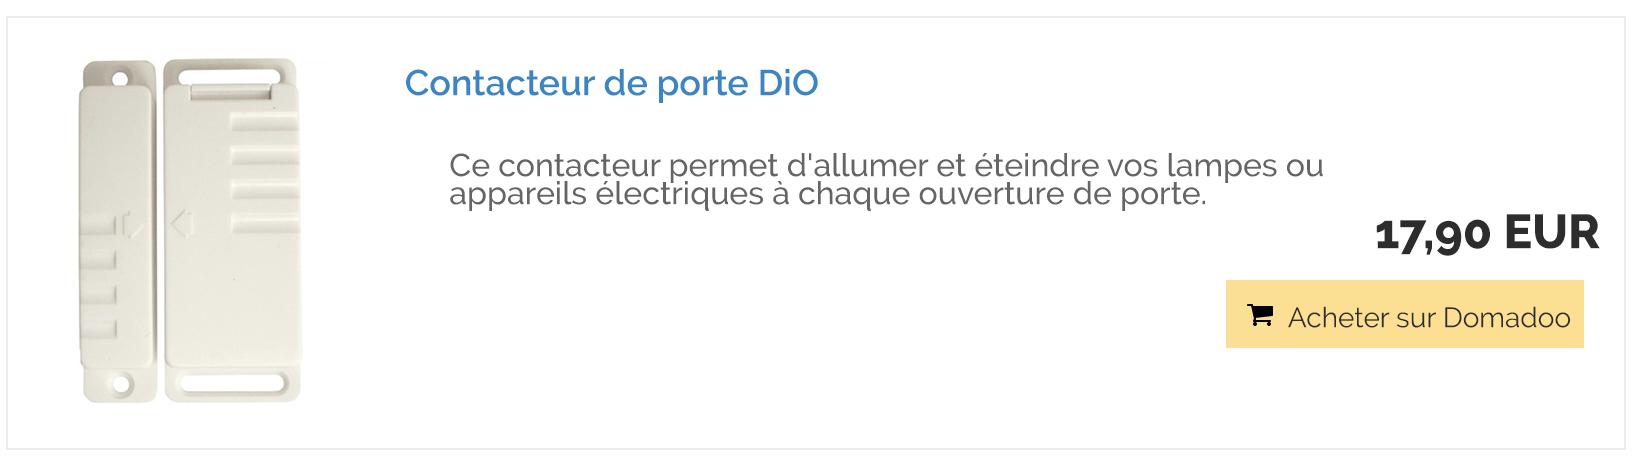 chacon-dio-contacteur-porte-domadoo